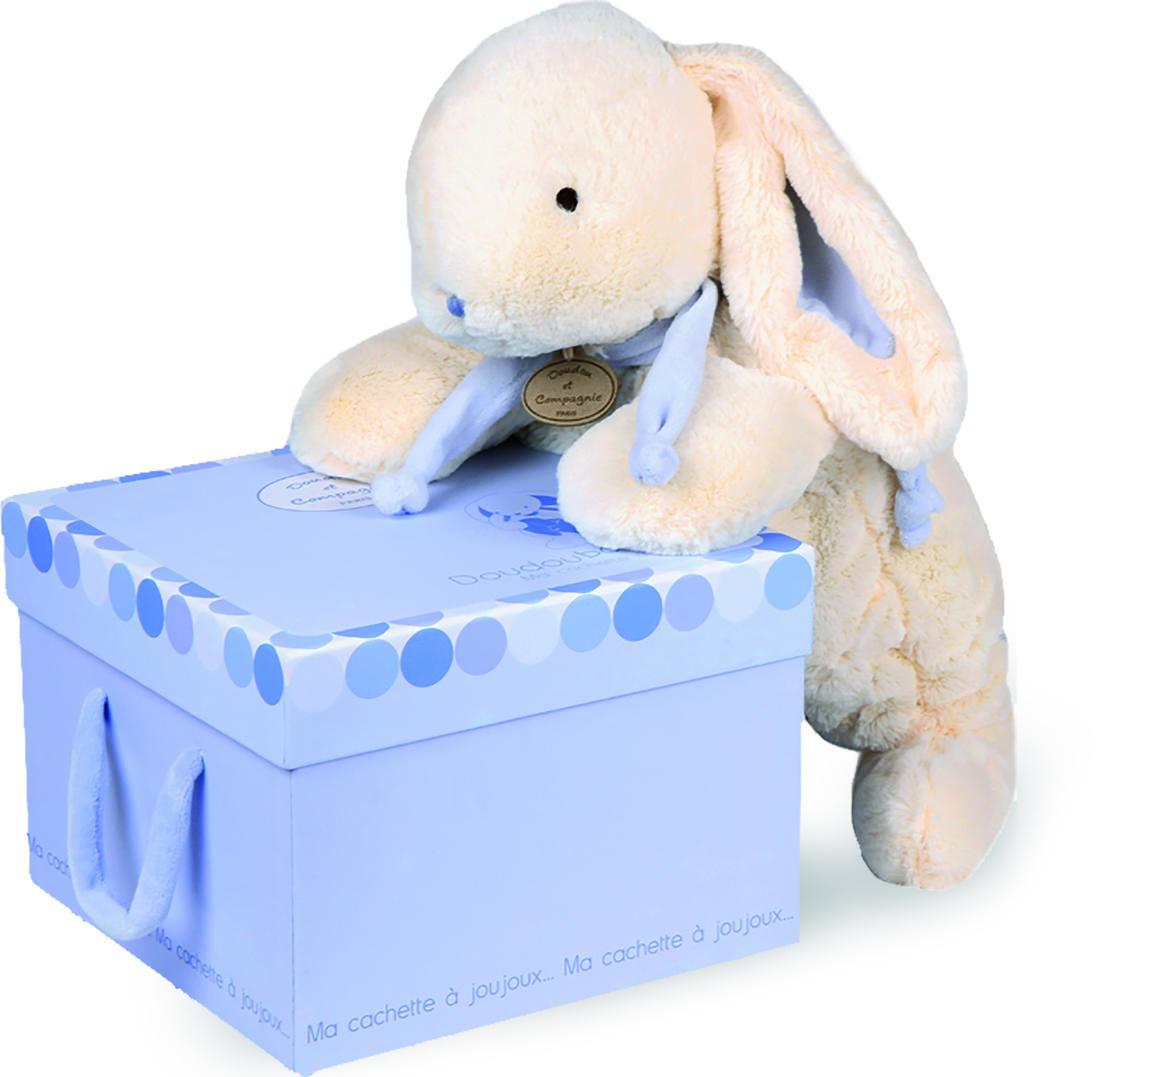 pj bag + gift box blue 45cm   Trada Marketplace